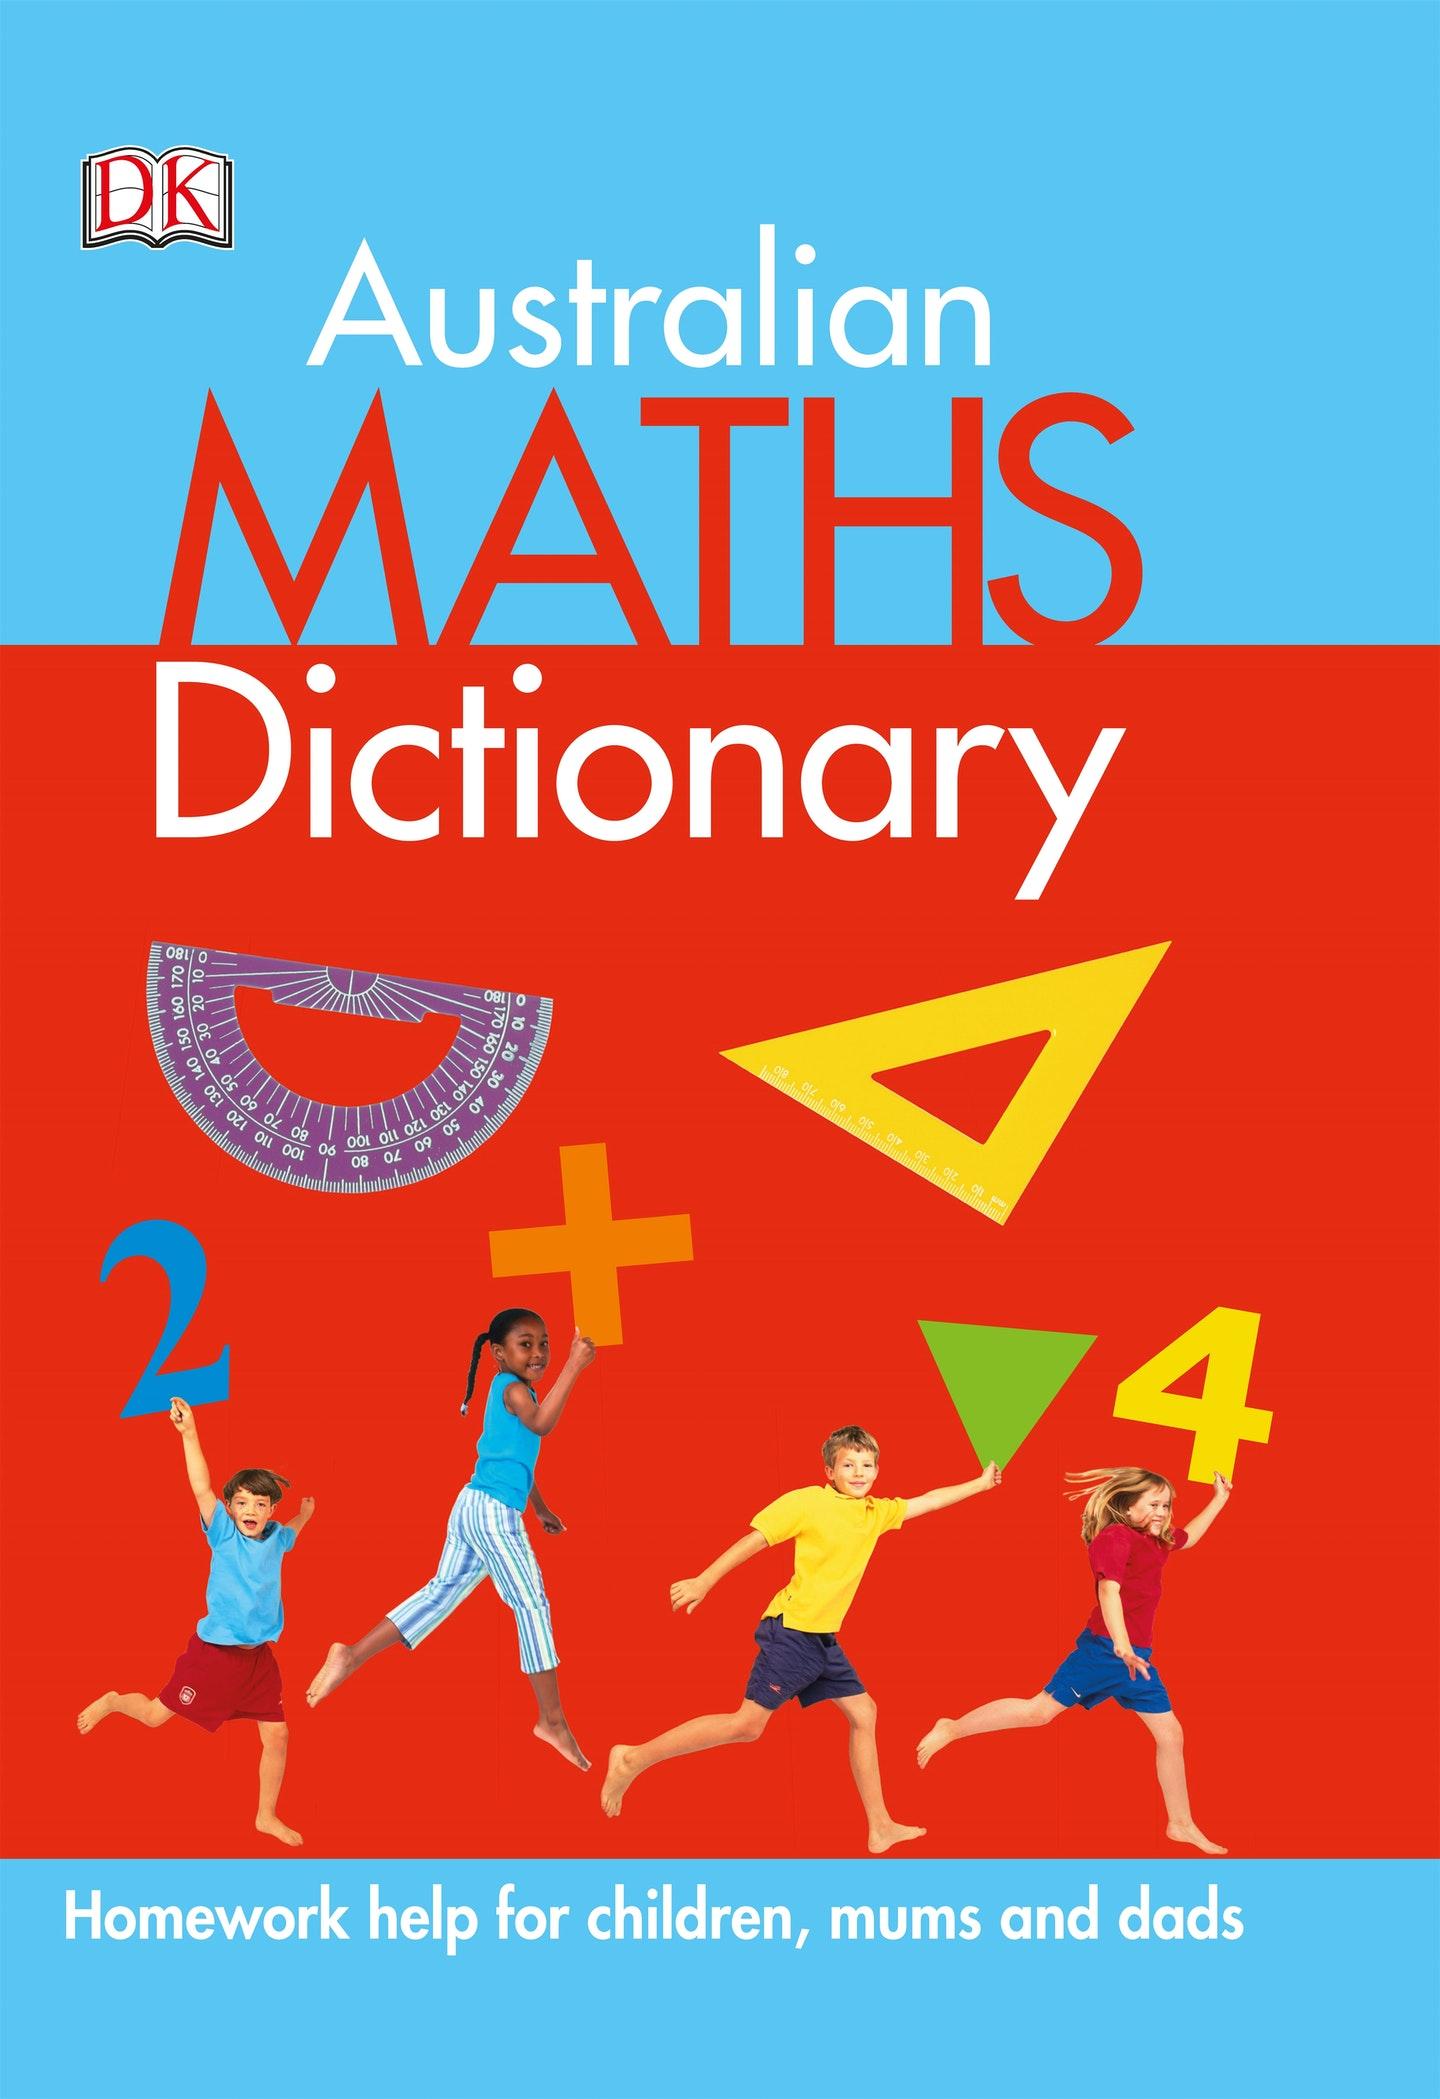 Book Covers For School Australia : Australian maths dictionary penguin books new zealand